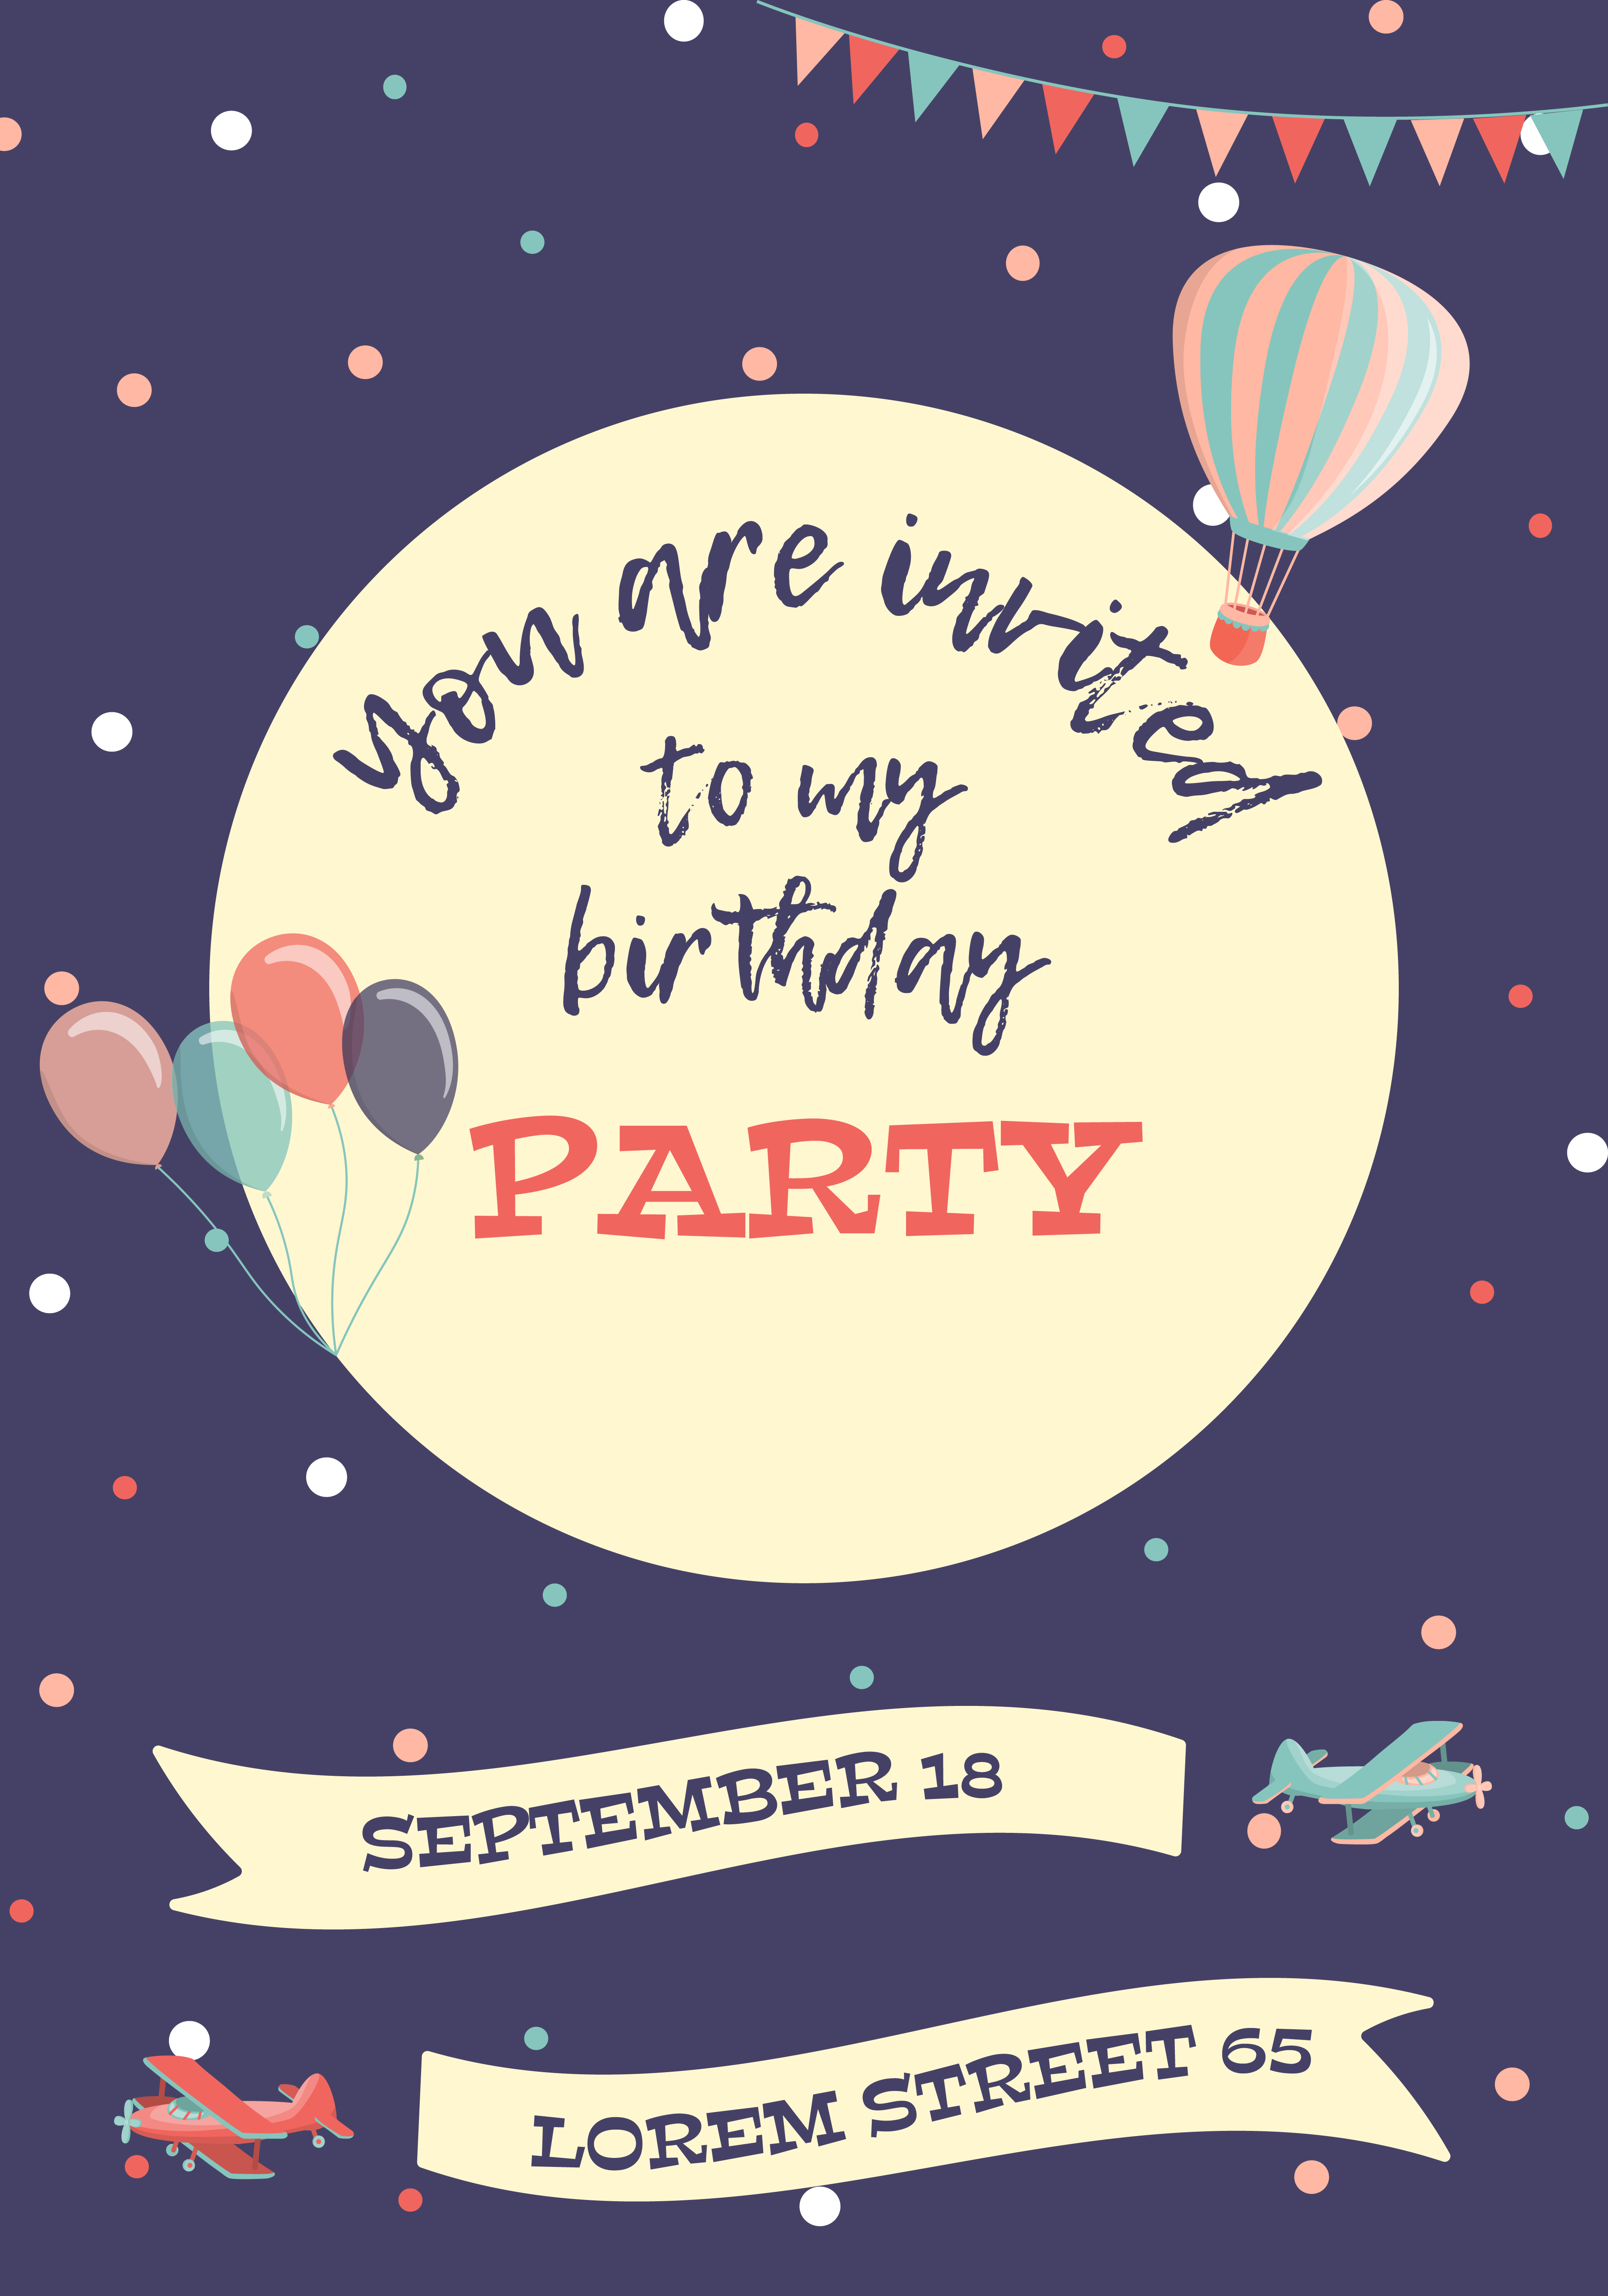 Birthday invitation card Download Free Vectors Clipart